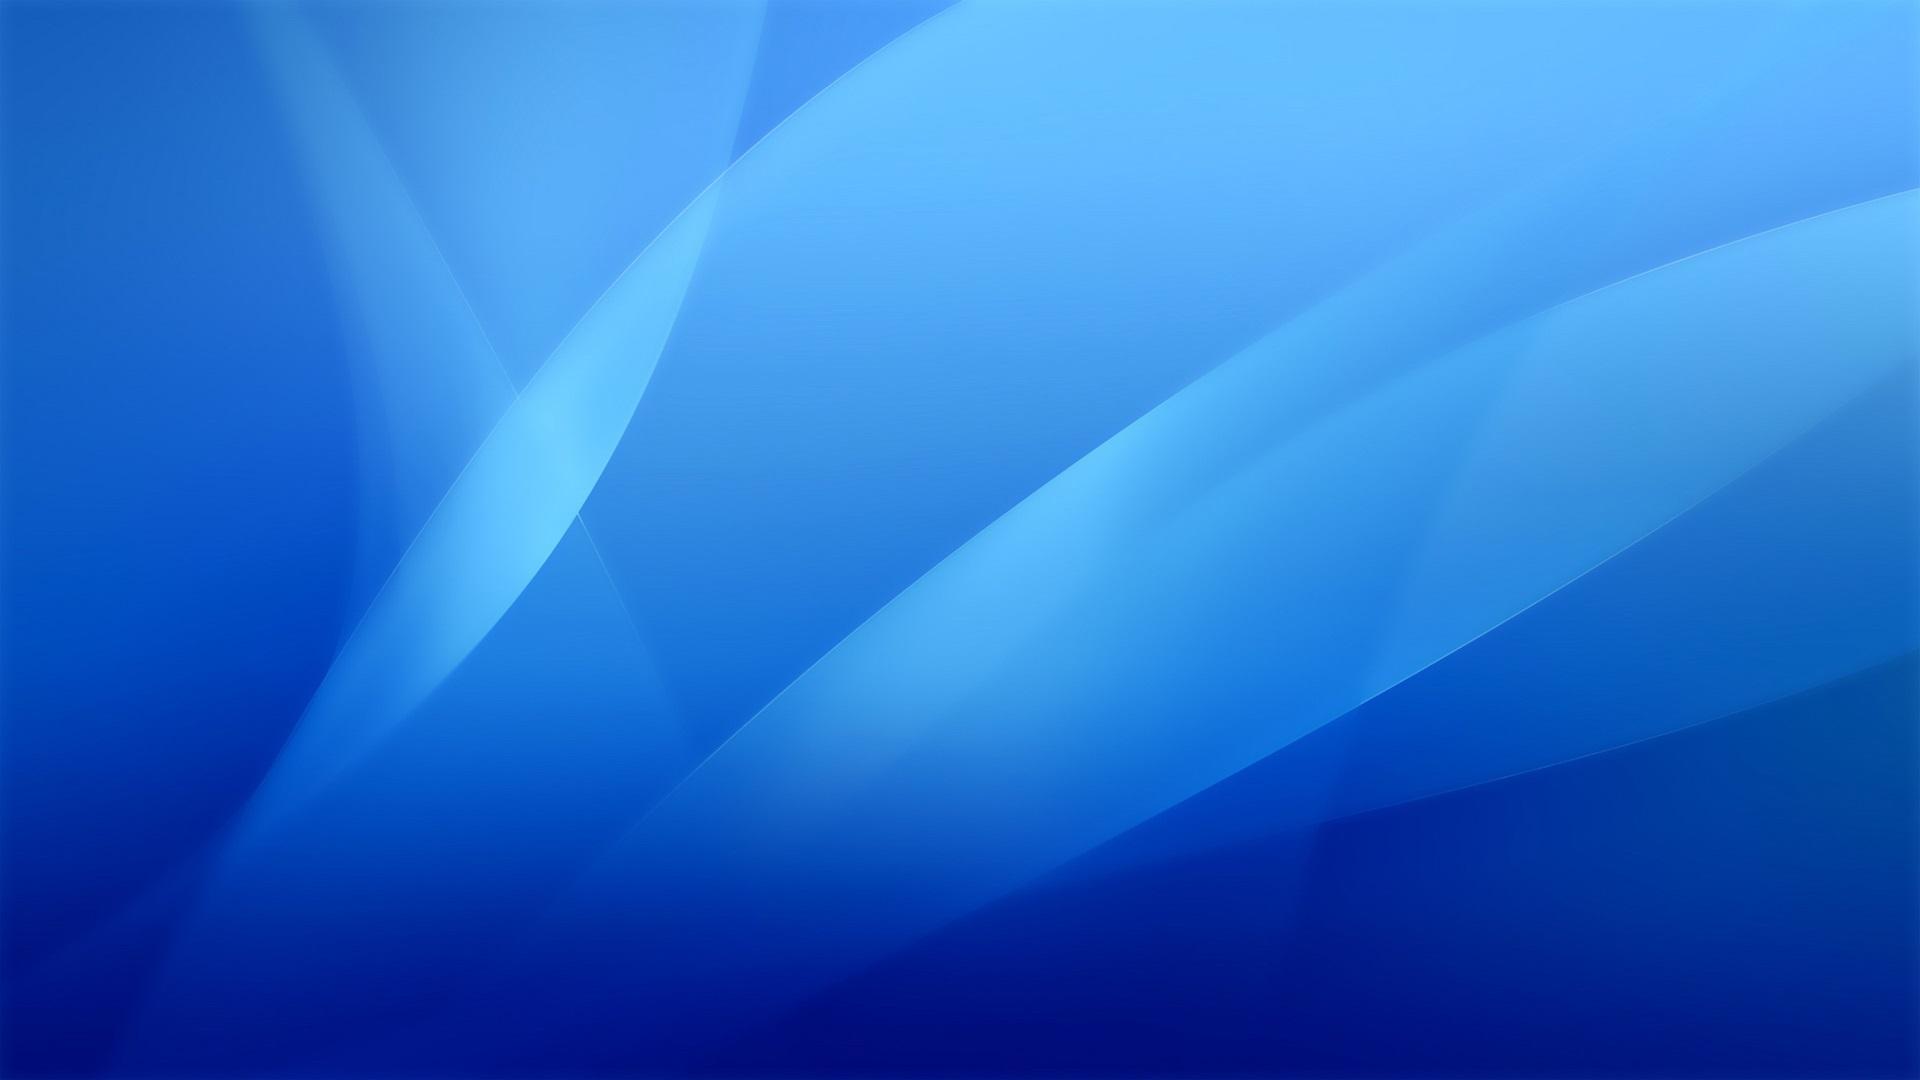 Fondos de pantalla azul resumen de antecedentes la curva for Fondos de pantalla full hd colores